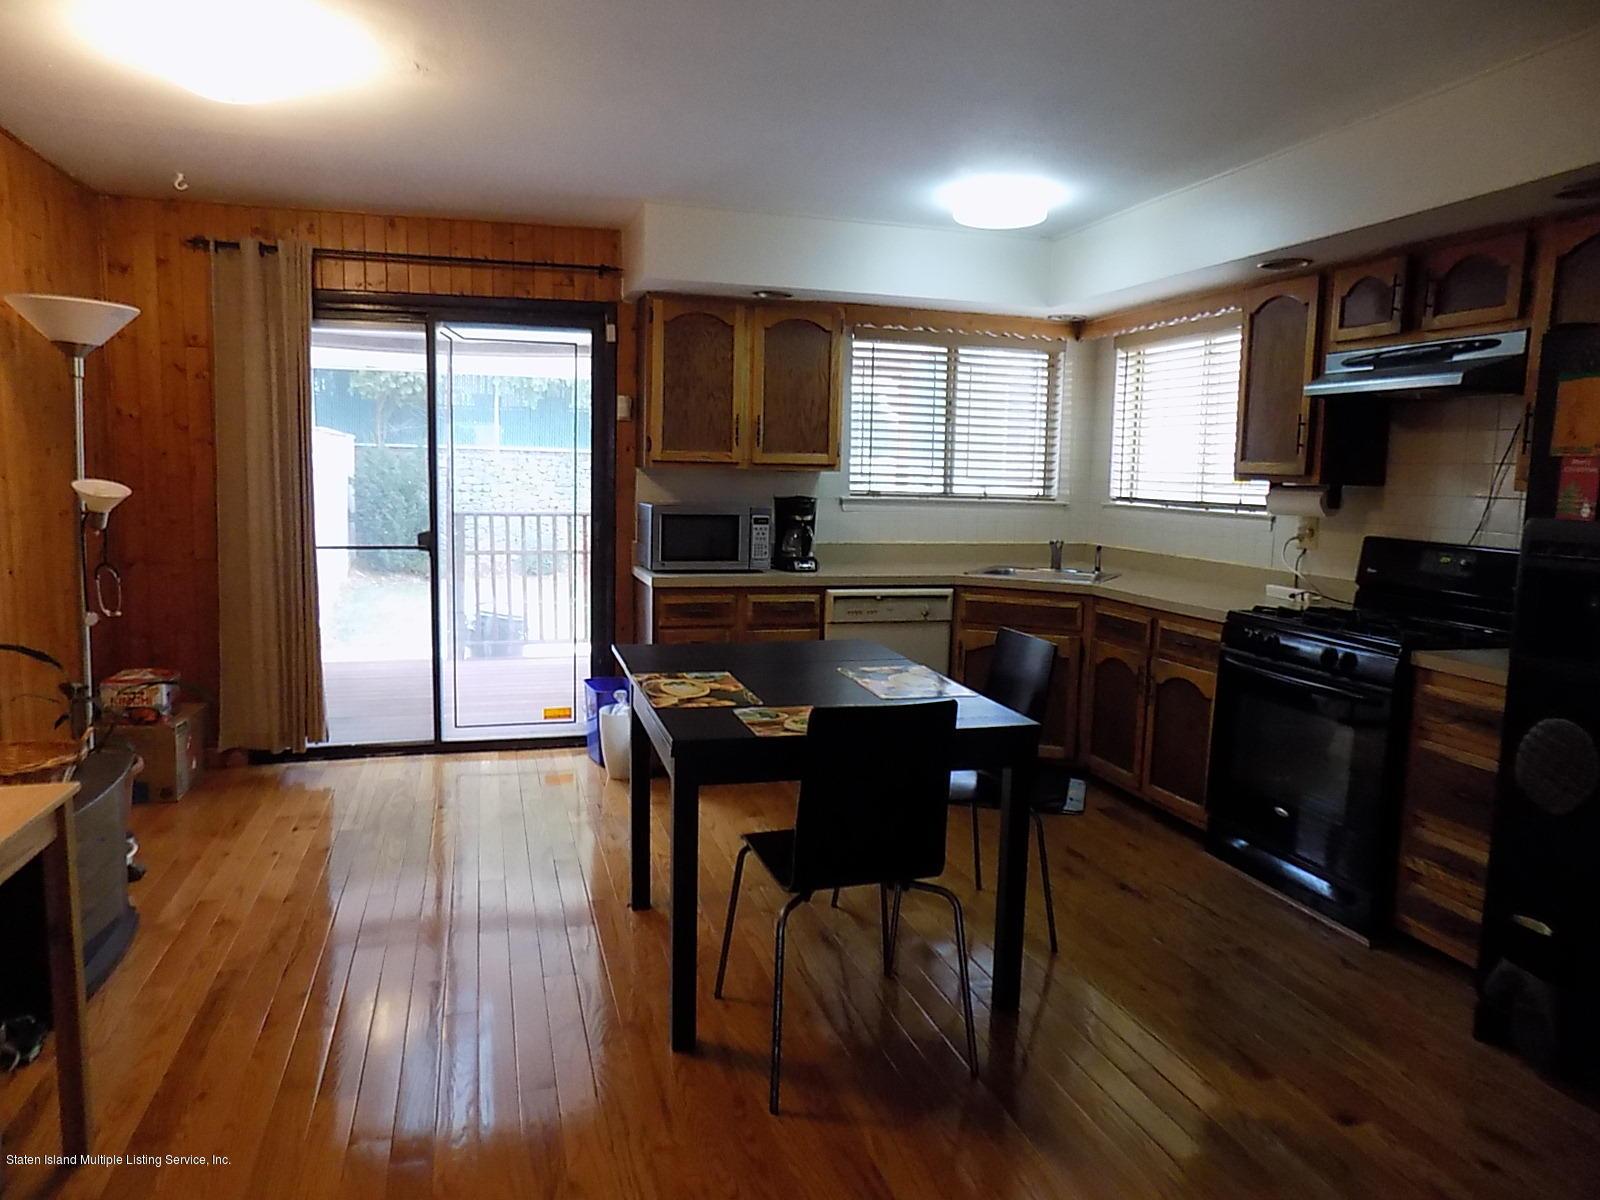 Single Family - Semi-Attached 85 Bogota Street  Staten Island, NY 10314, MLS-1126026-7